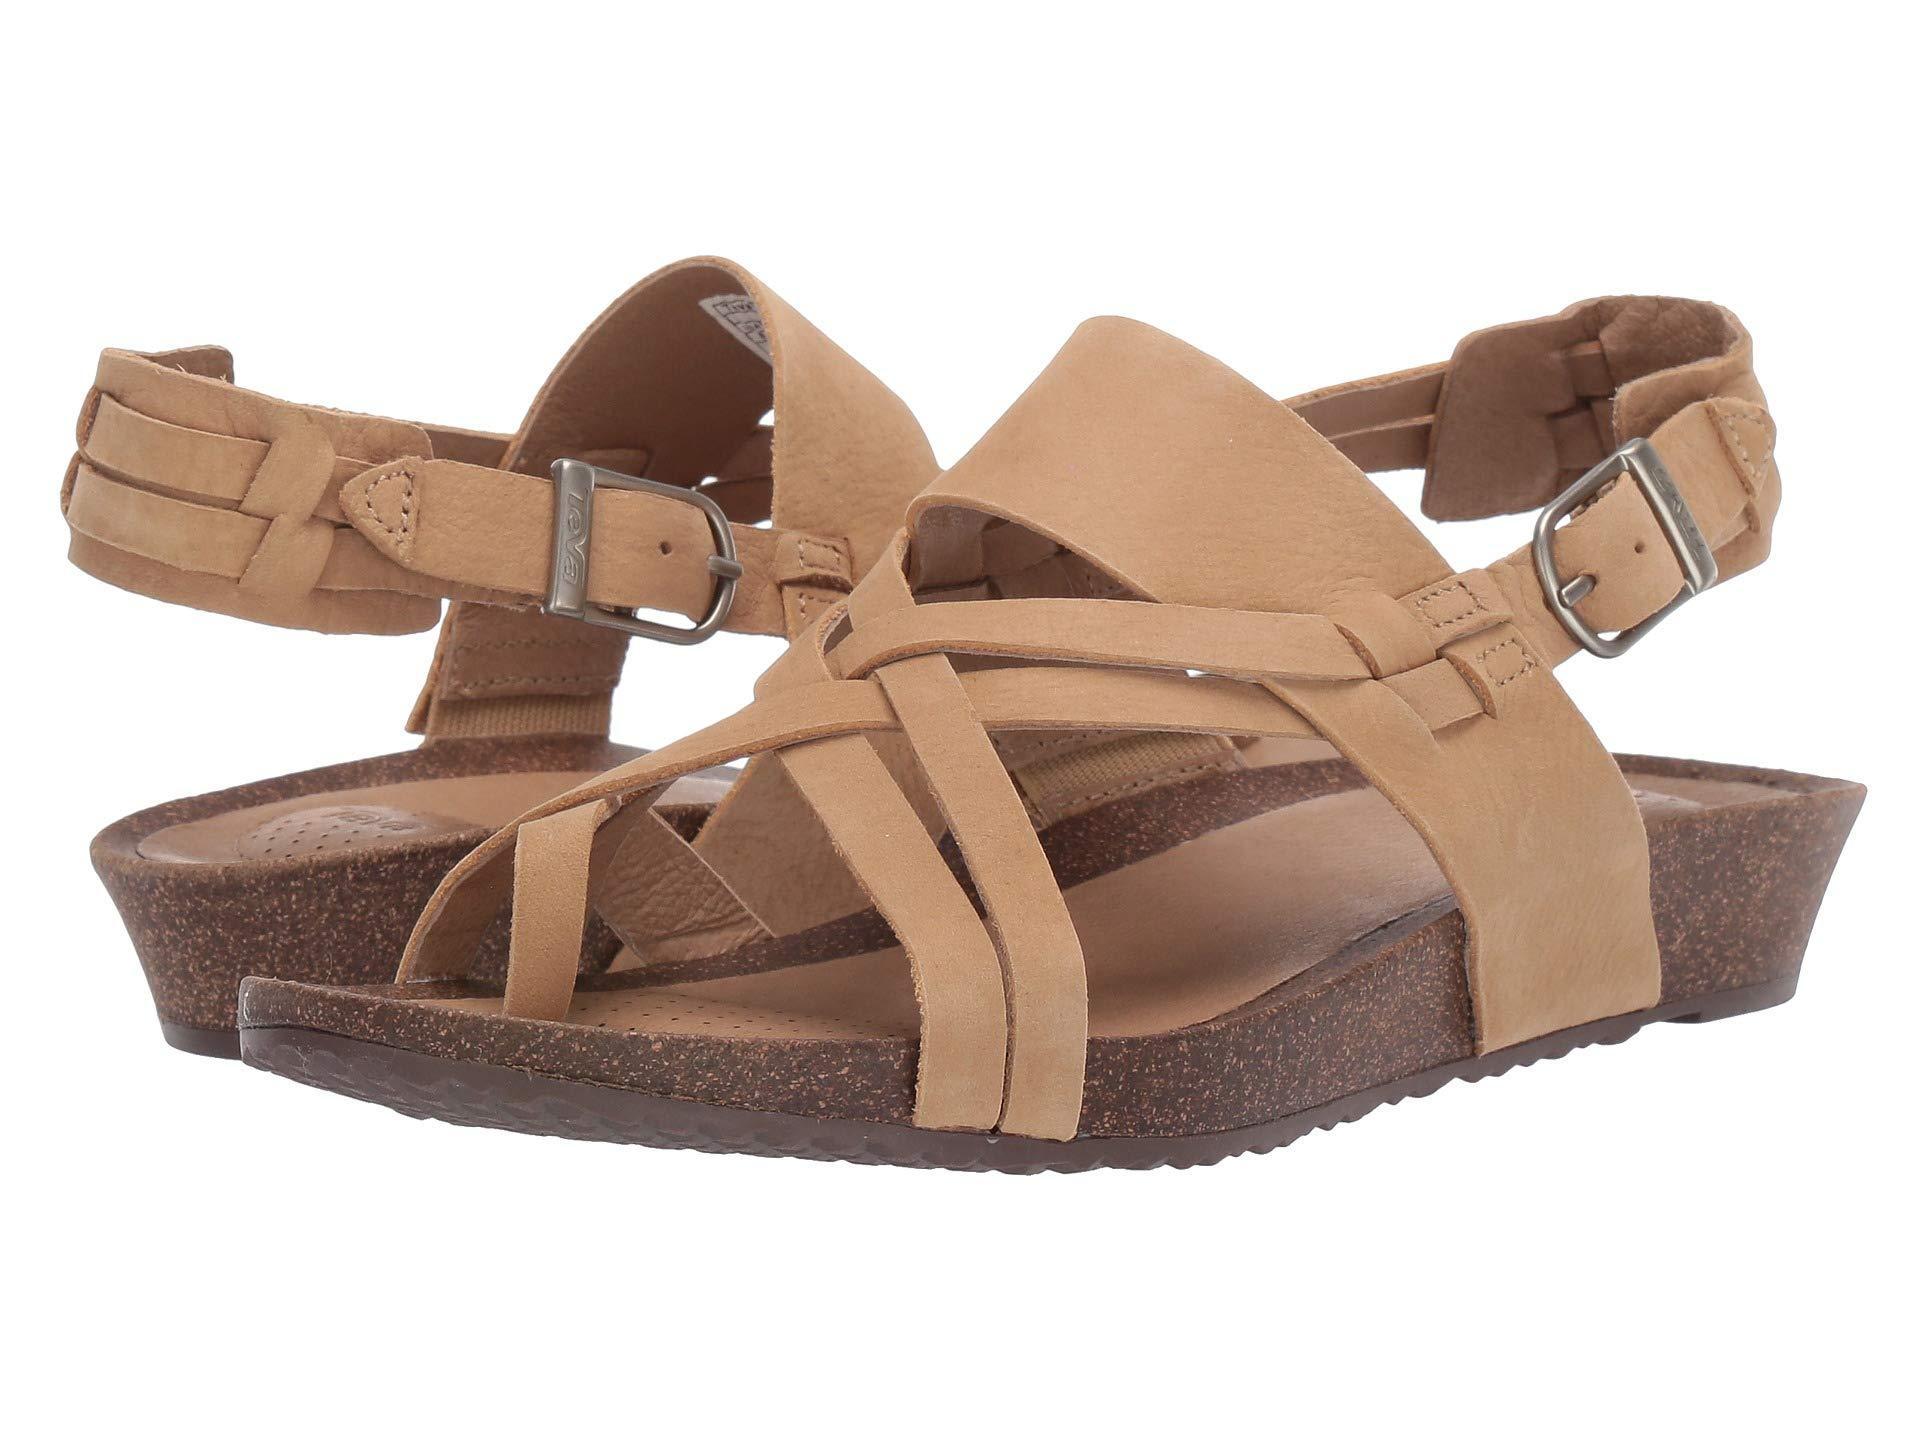 4eee3f077 Lyst - Teva Ysidro Extension (black) Women s Shoes